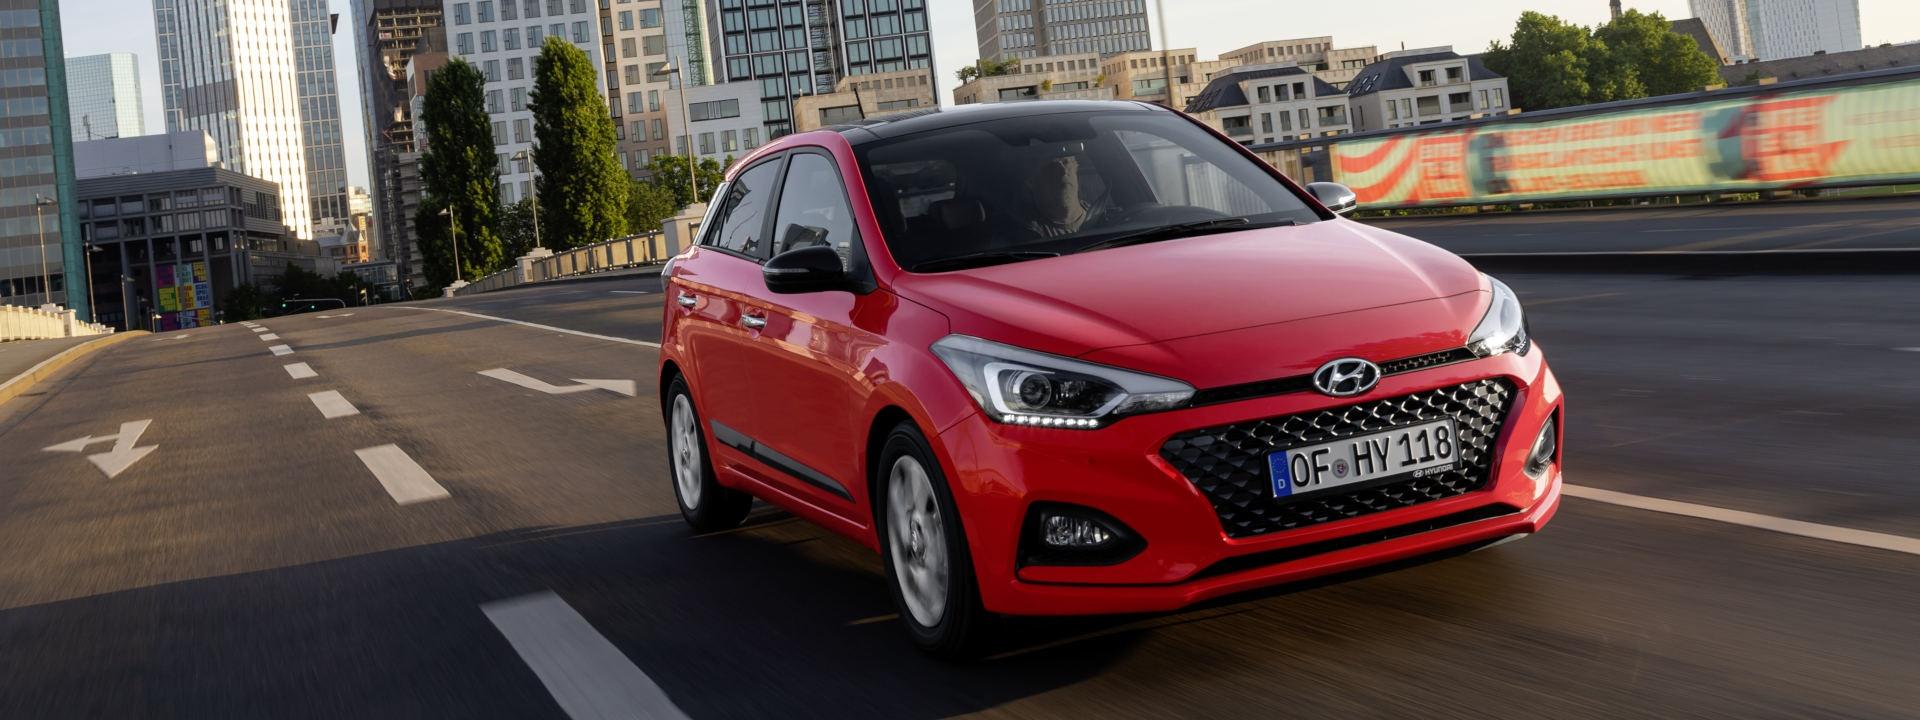 Hyundai i20 Import-Kleinwagen